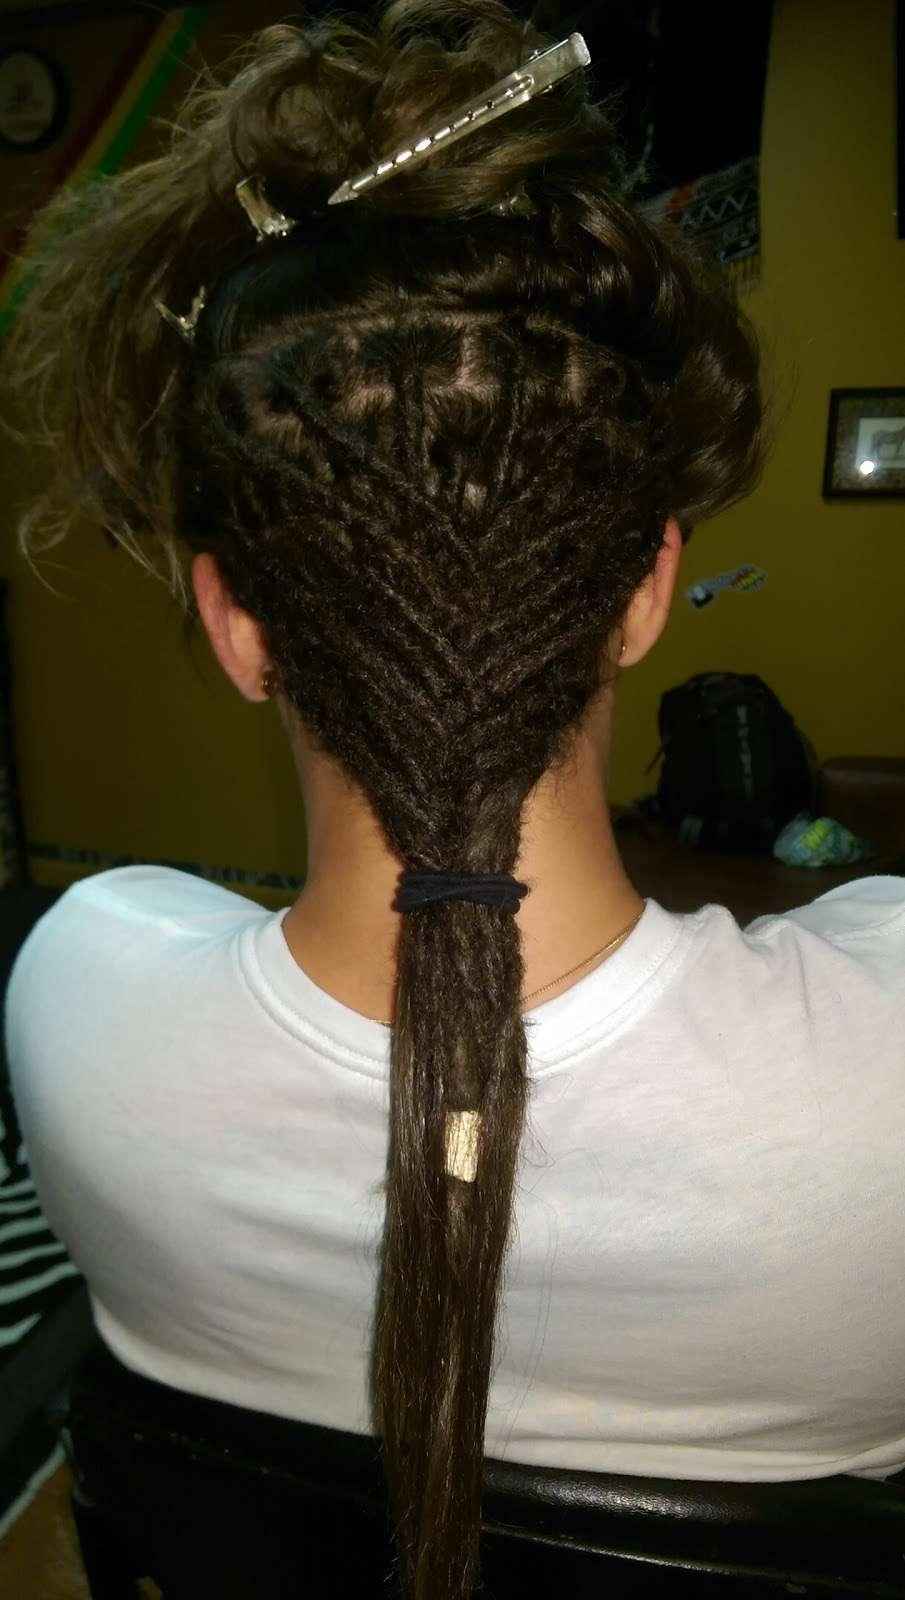 The Natty Studio, LLC...APPT ONLY - hair care  | Photo 10 of 10 | Address: APPT ONLY, Plantation, FL 33313, USA | Phone: (954) 253-2576